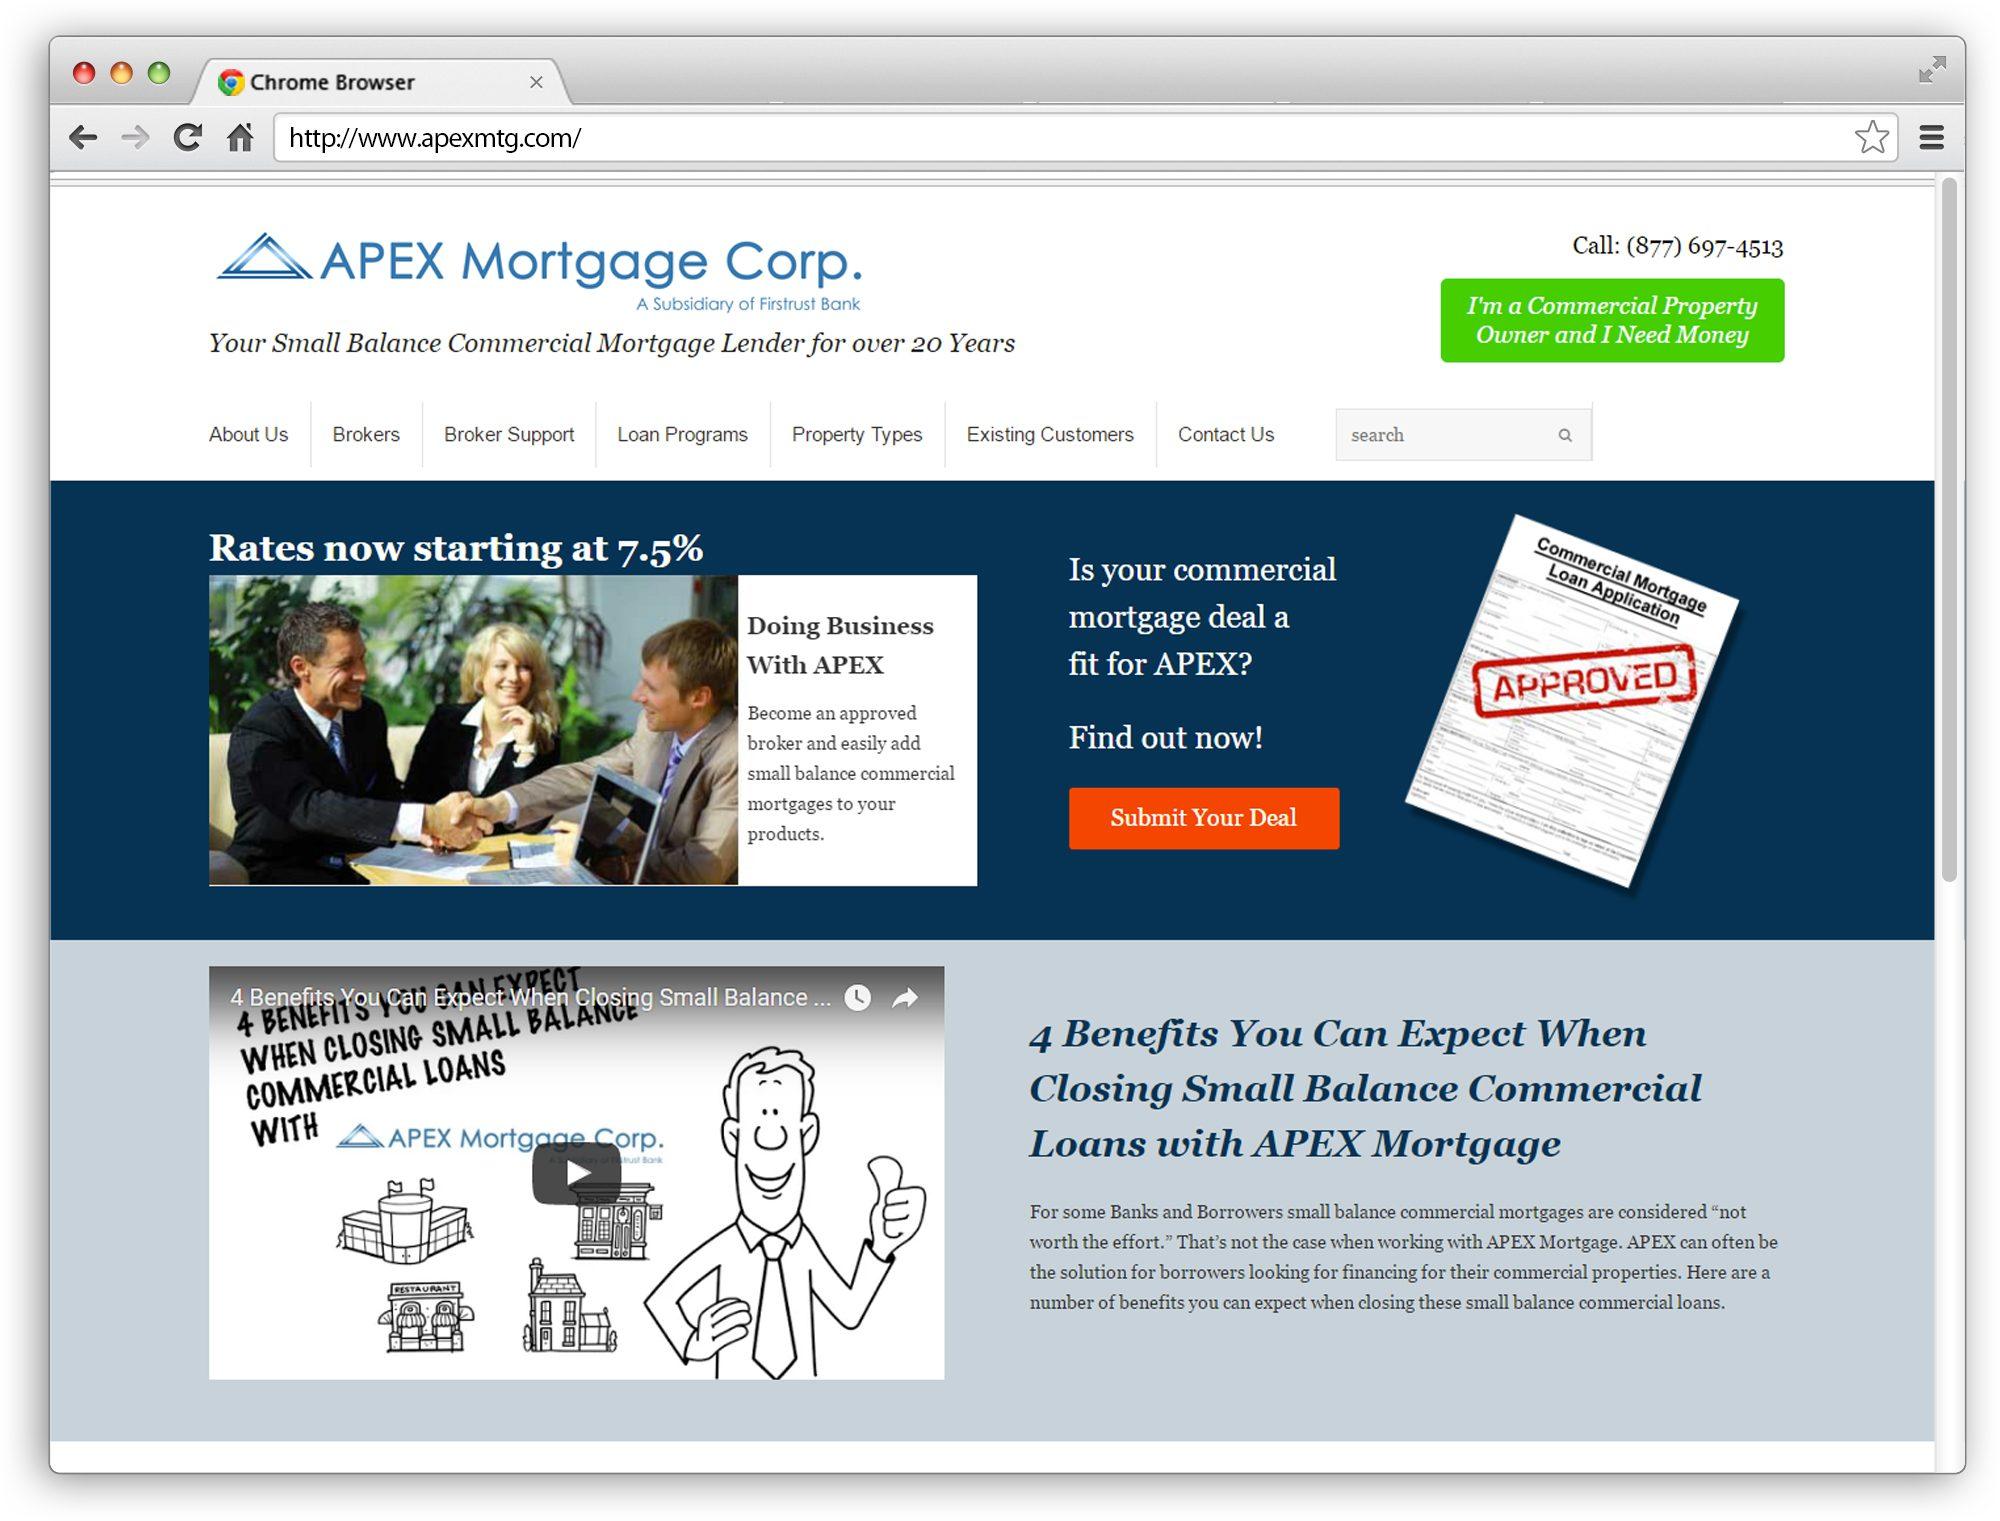 APEX Mortgage